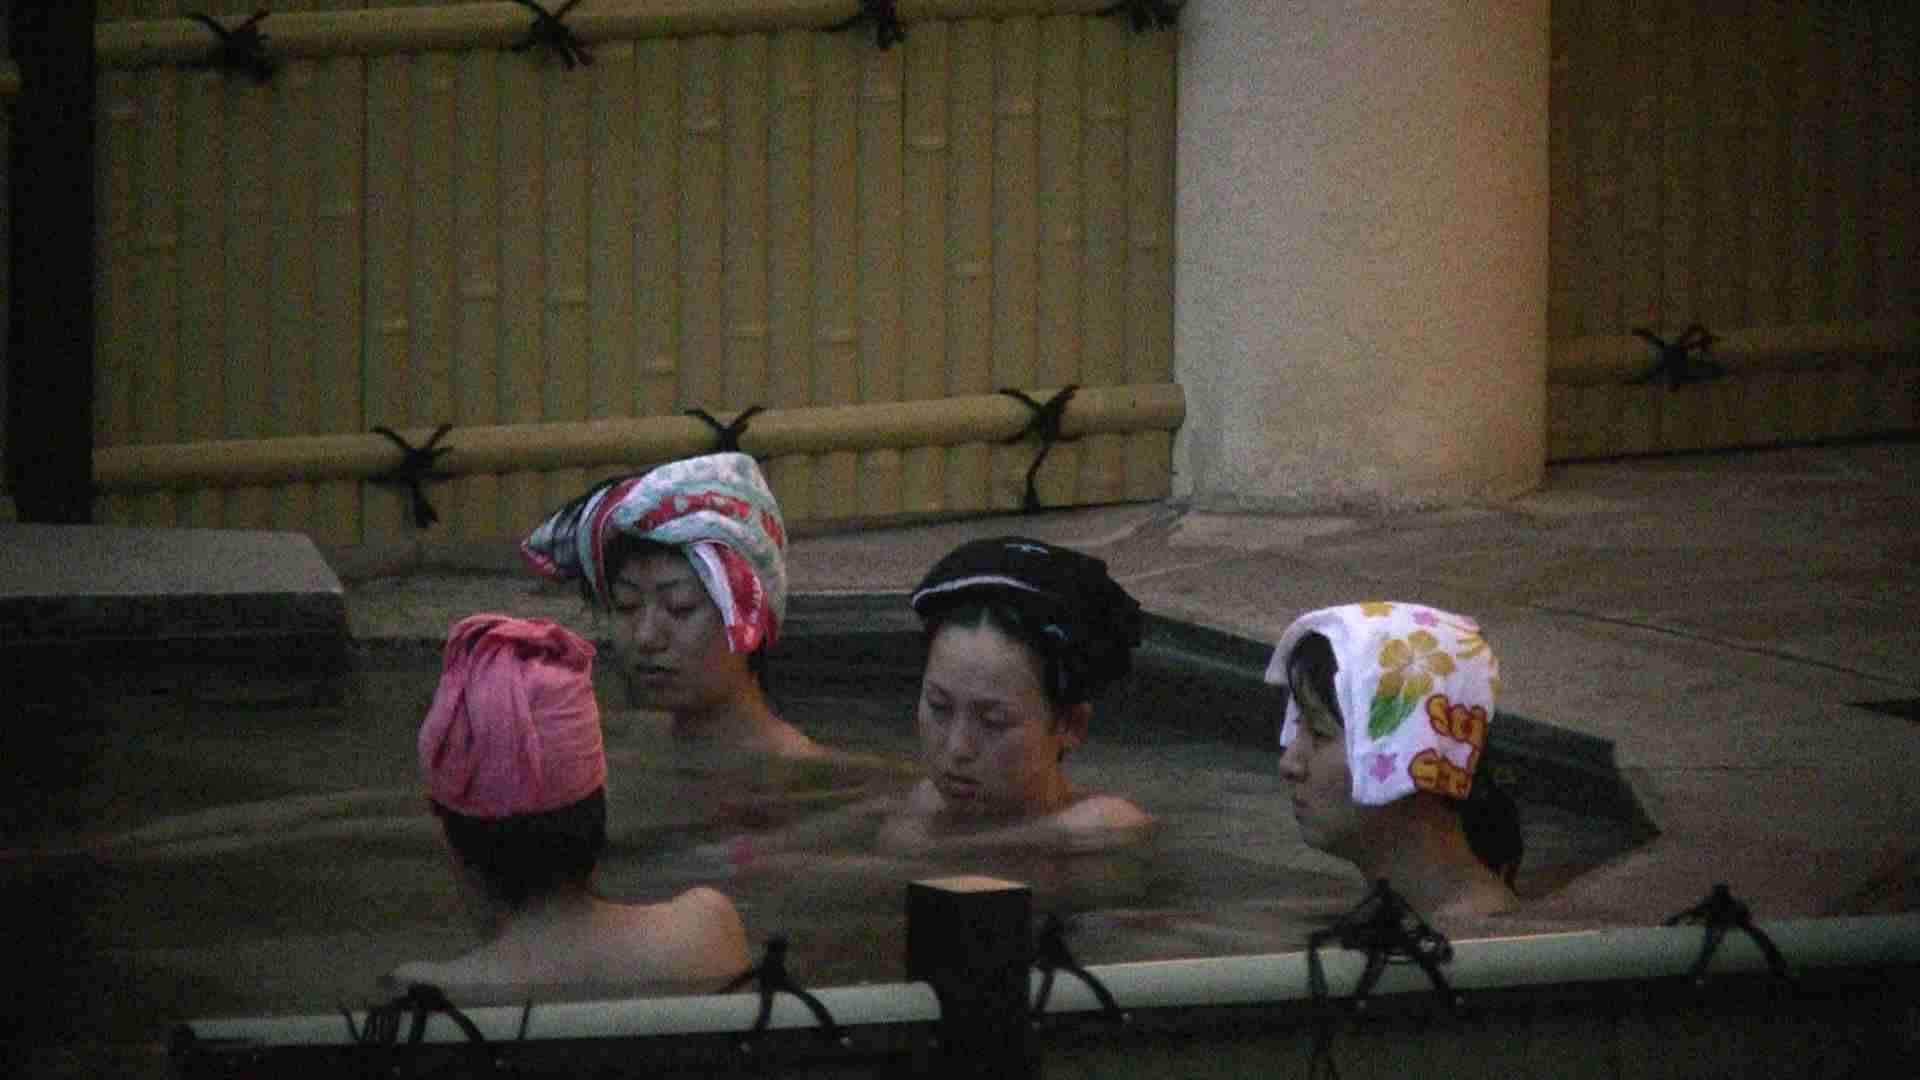 Aquaな露天風呂Vol.149 露天風呂突入 オマンコ動画キャプチャ 101pic 77